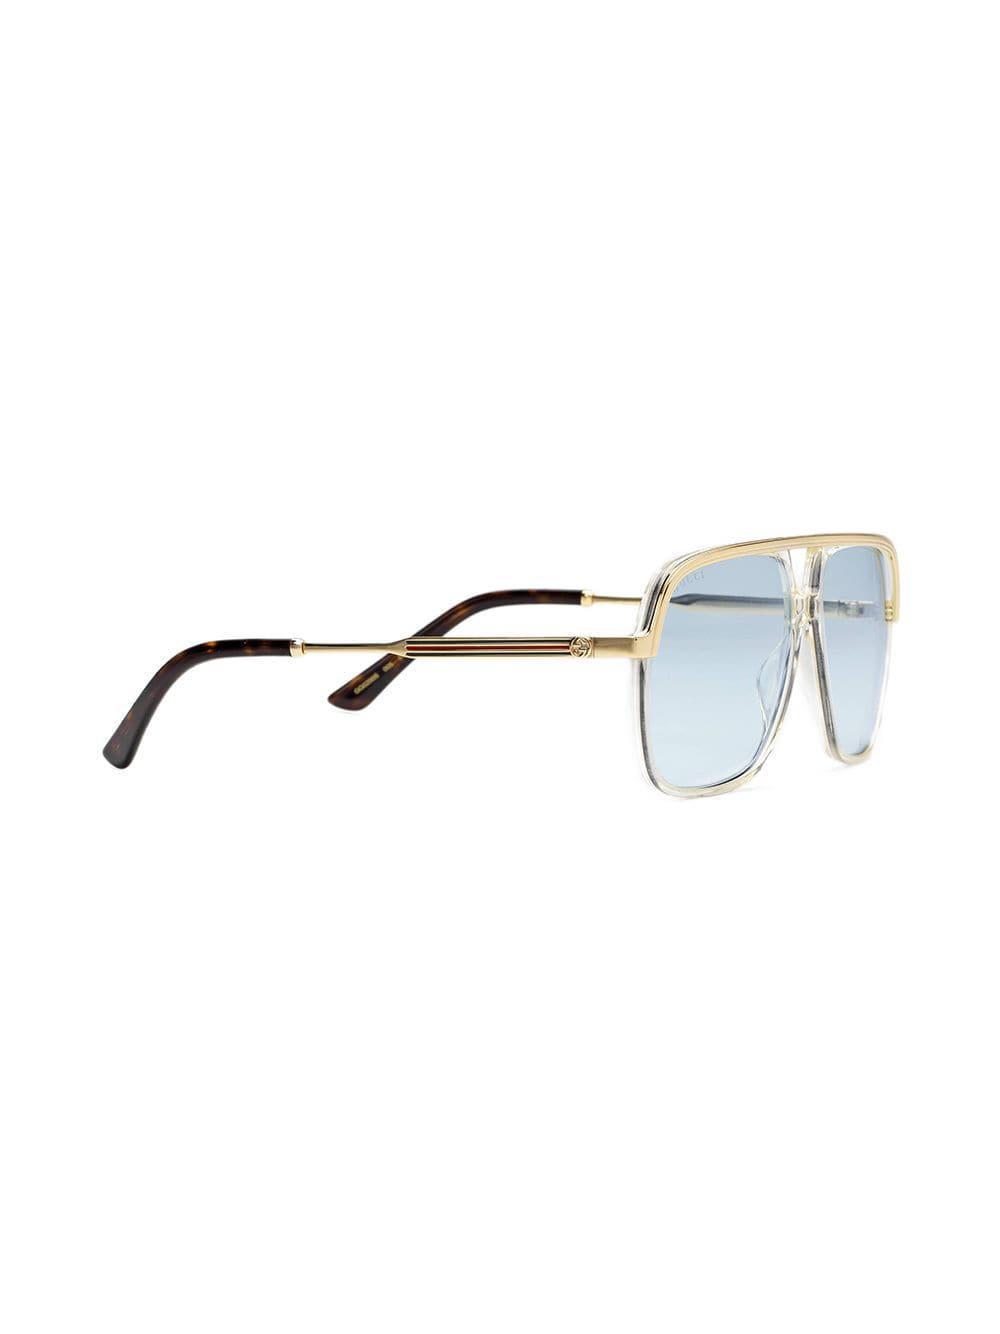 29e6b7bbd3b7 Gucci Rectangular-frame Metal Sunglasses in Metallic for Men - Lyst